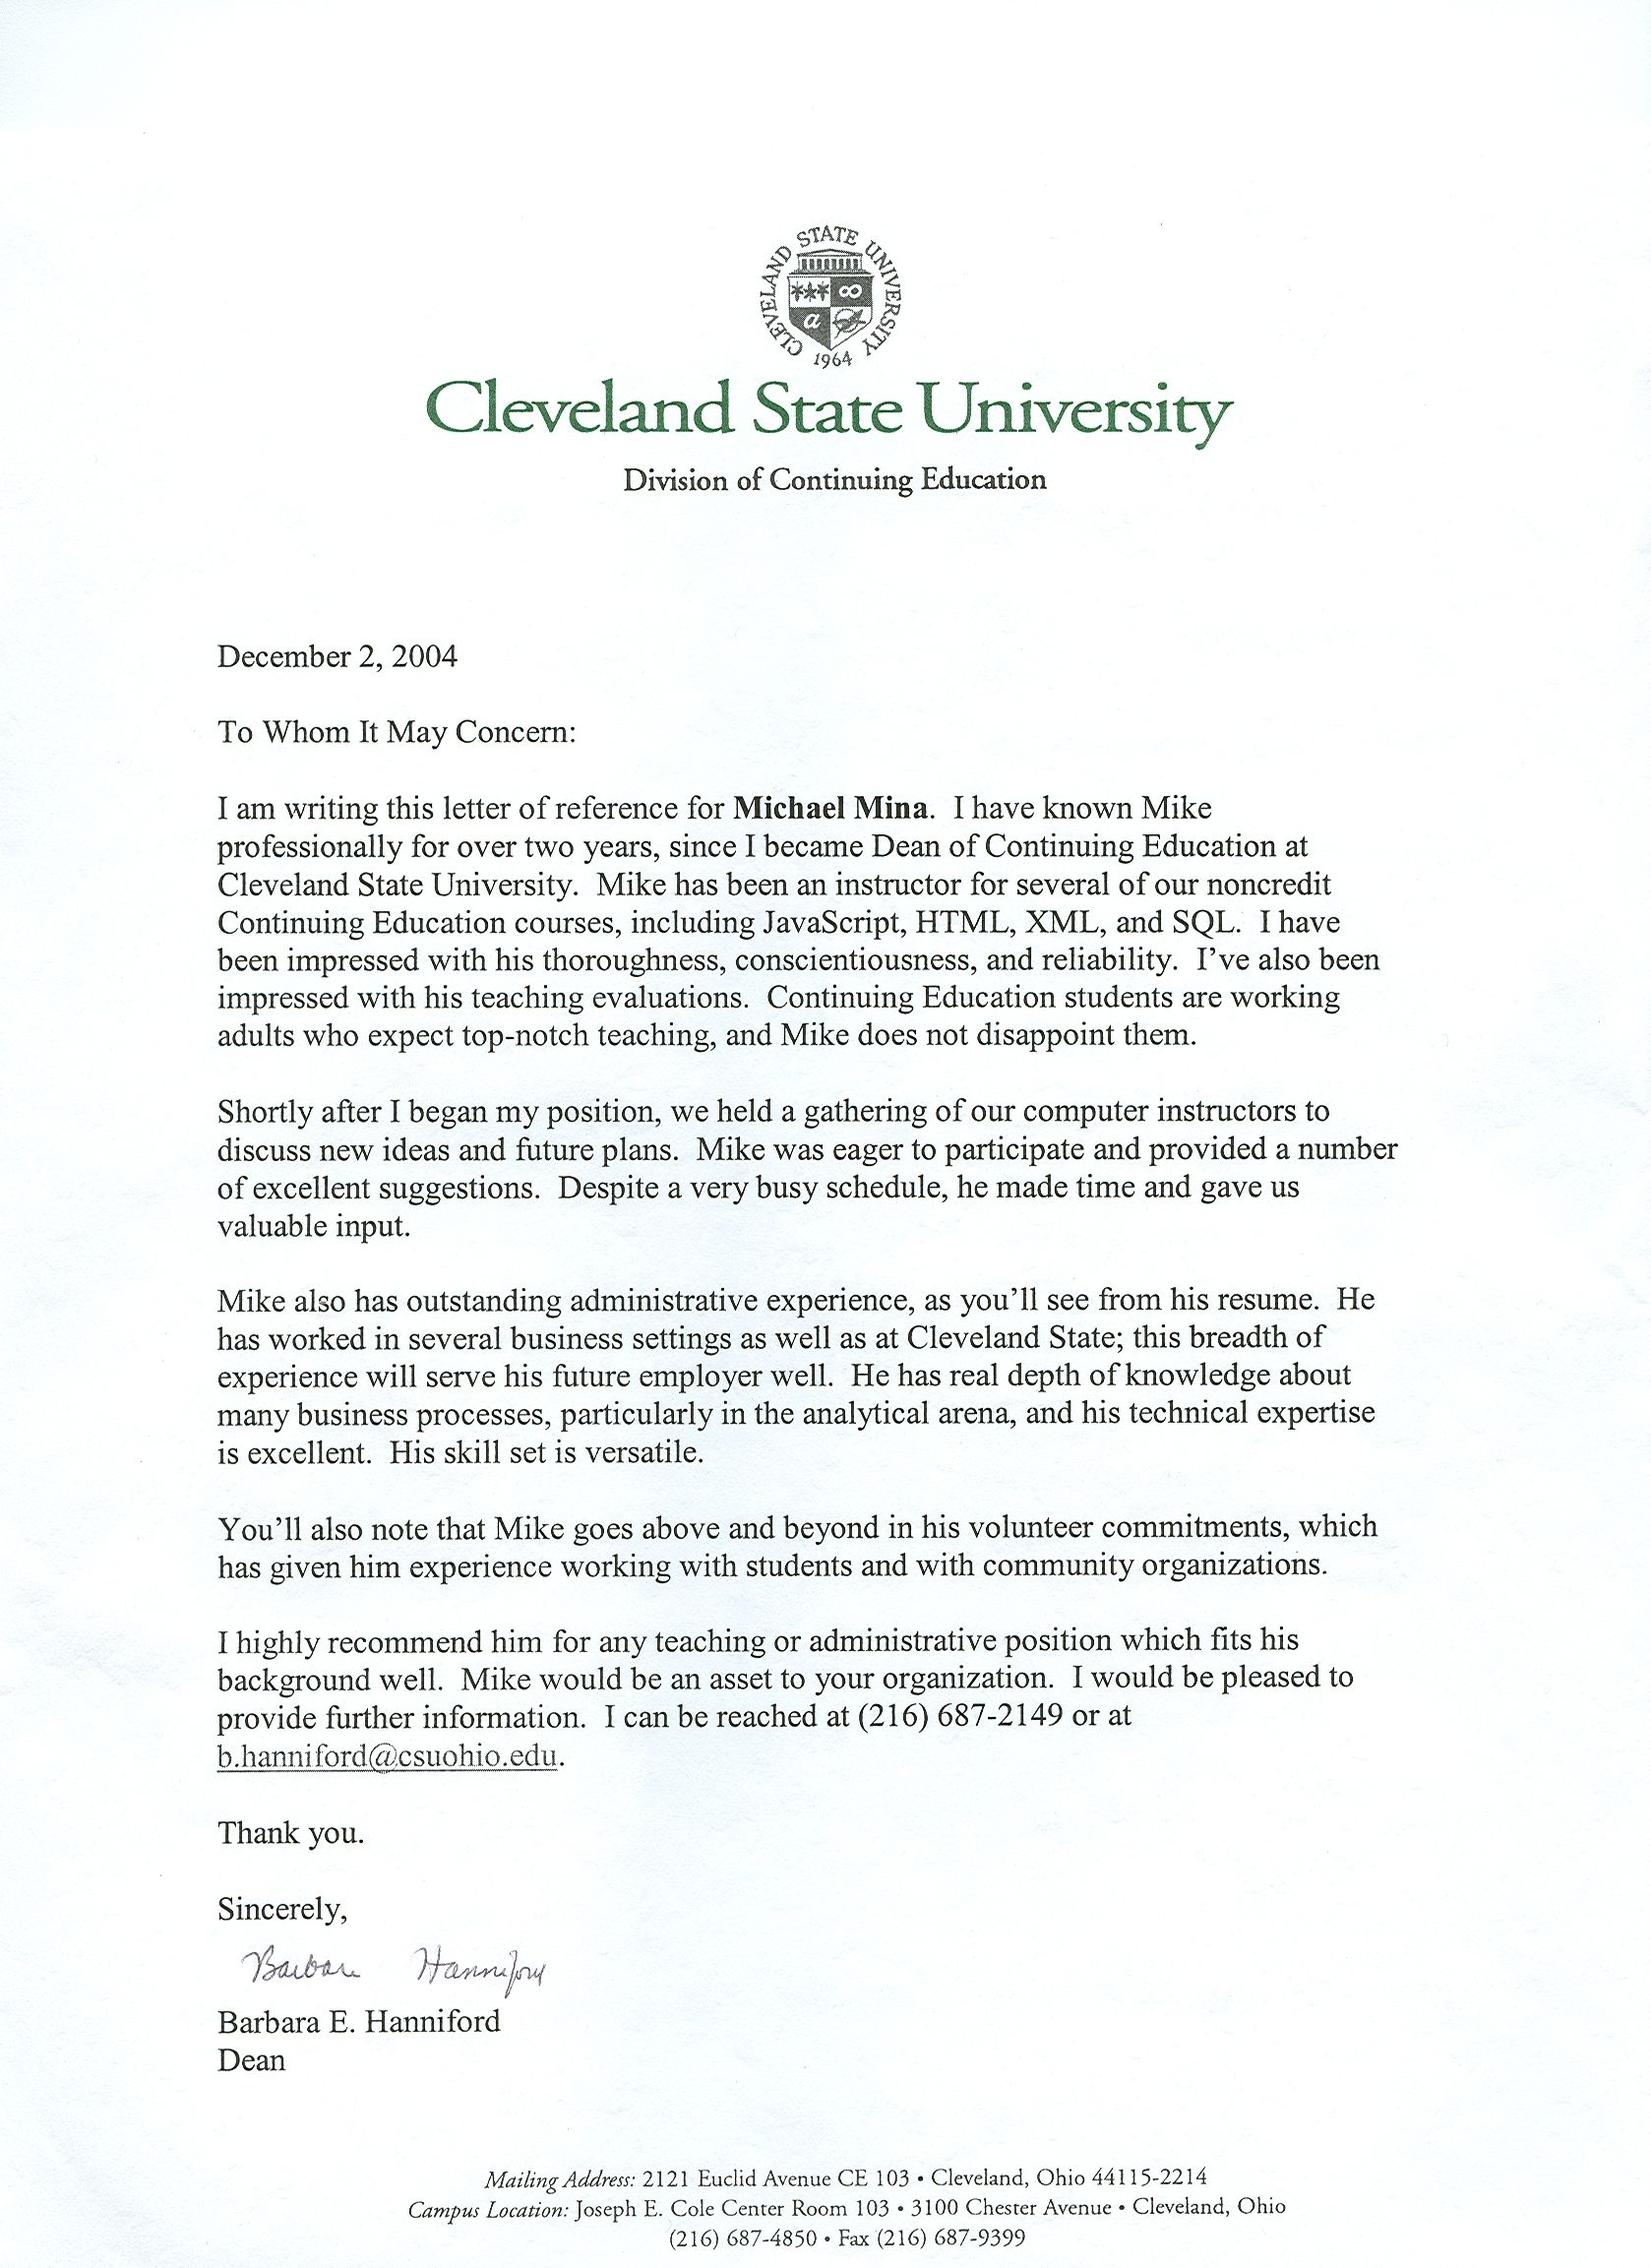 Recommendation Letter For Assistant Professor Position